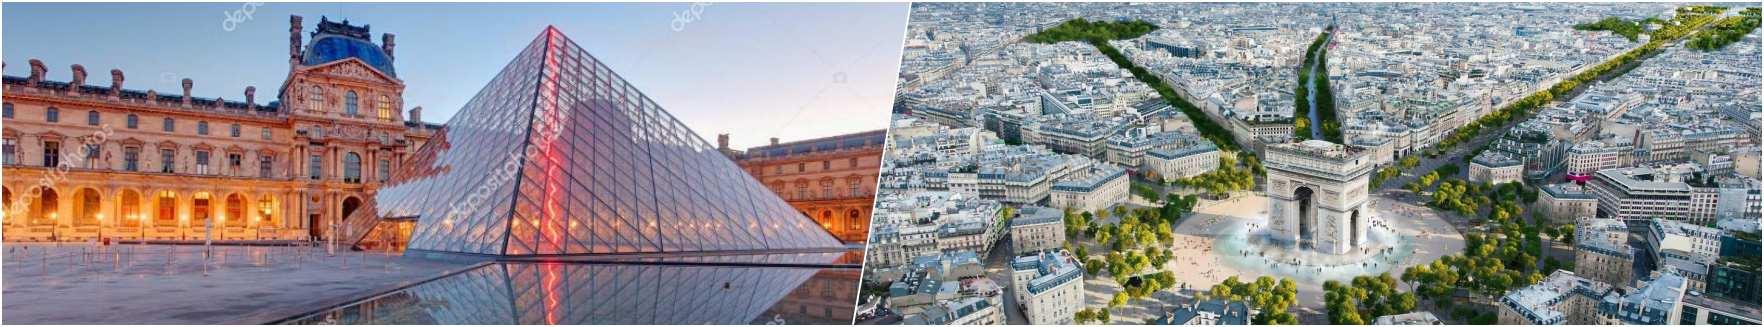 Louvre - Champs Elysees